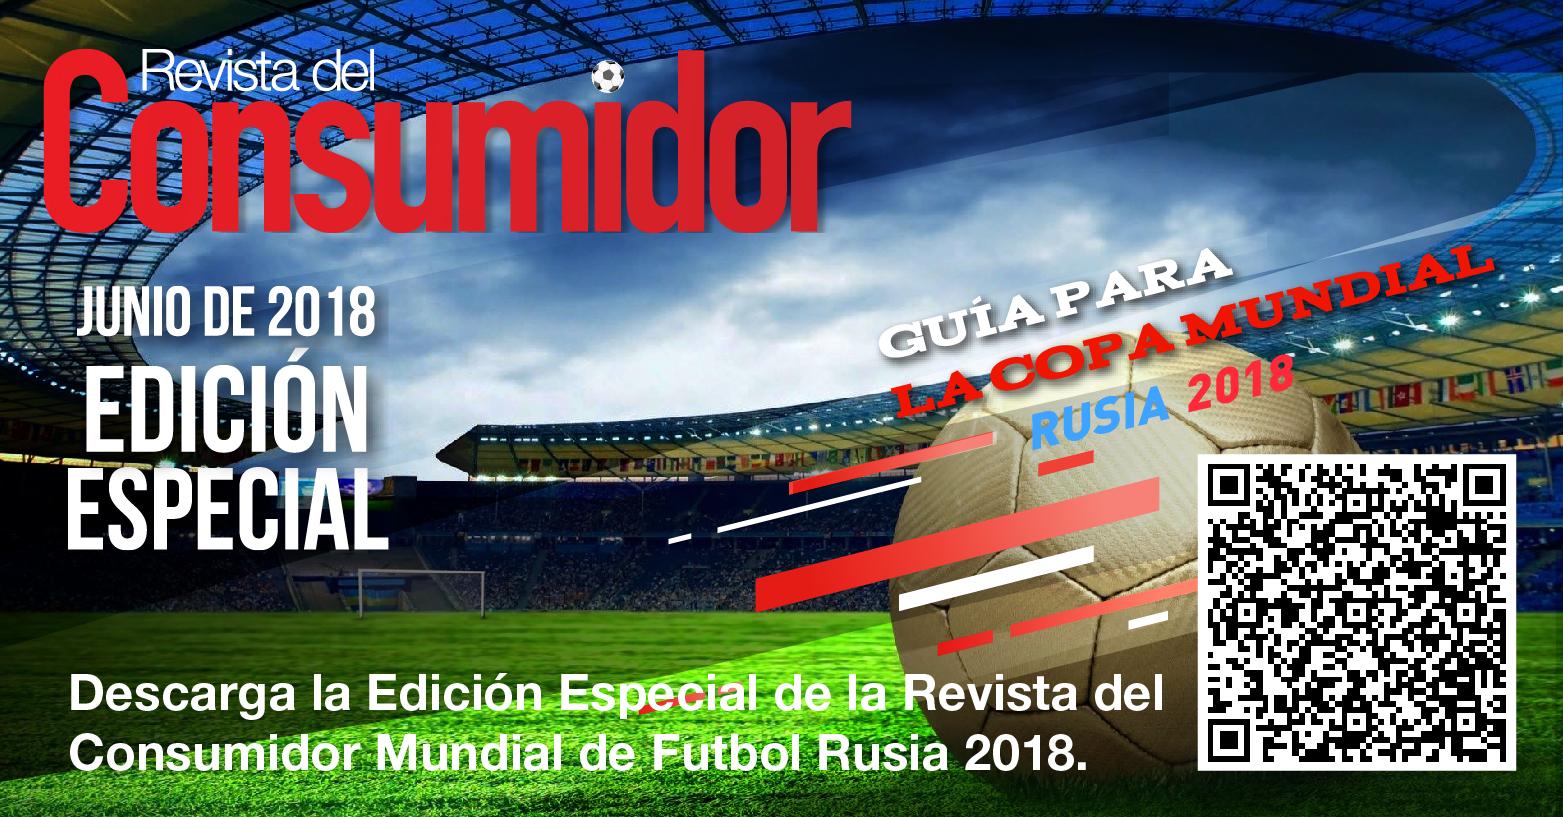 Edición Especial Revista del Consumidor Mundial Rusia 2018.   cms uploads image file 410055 Banners RevistaRusia2018A-02-02 b394541034b57